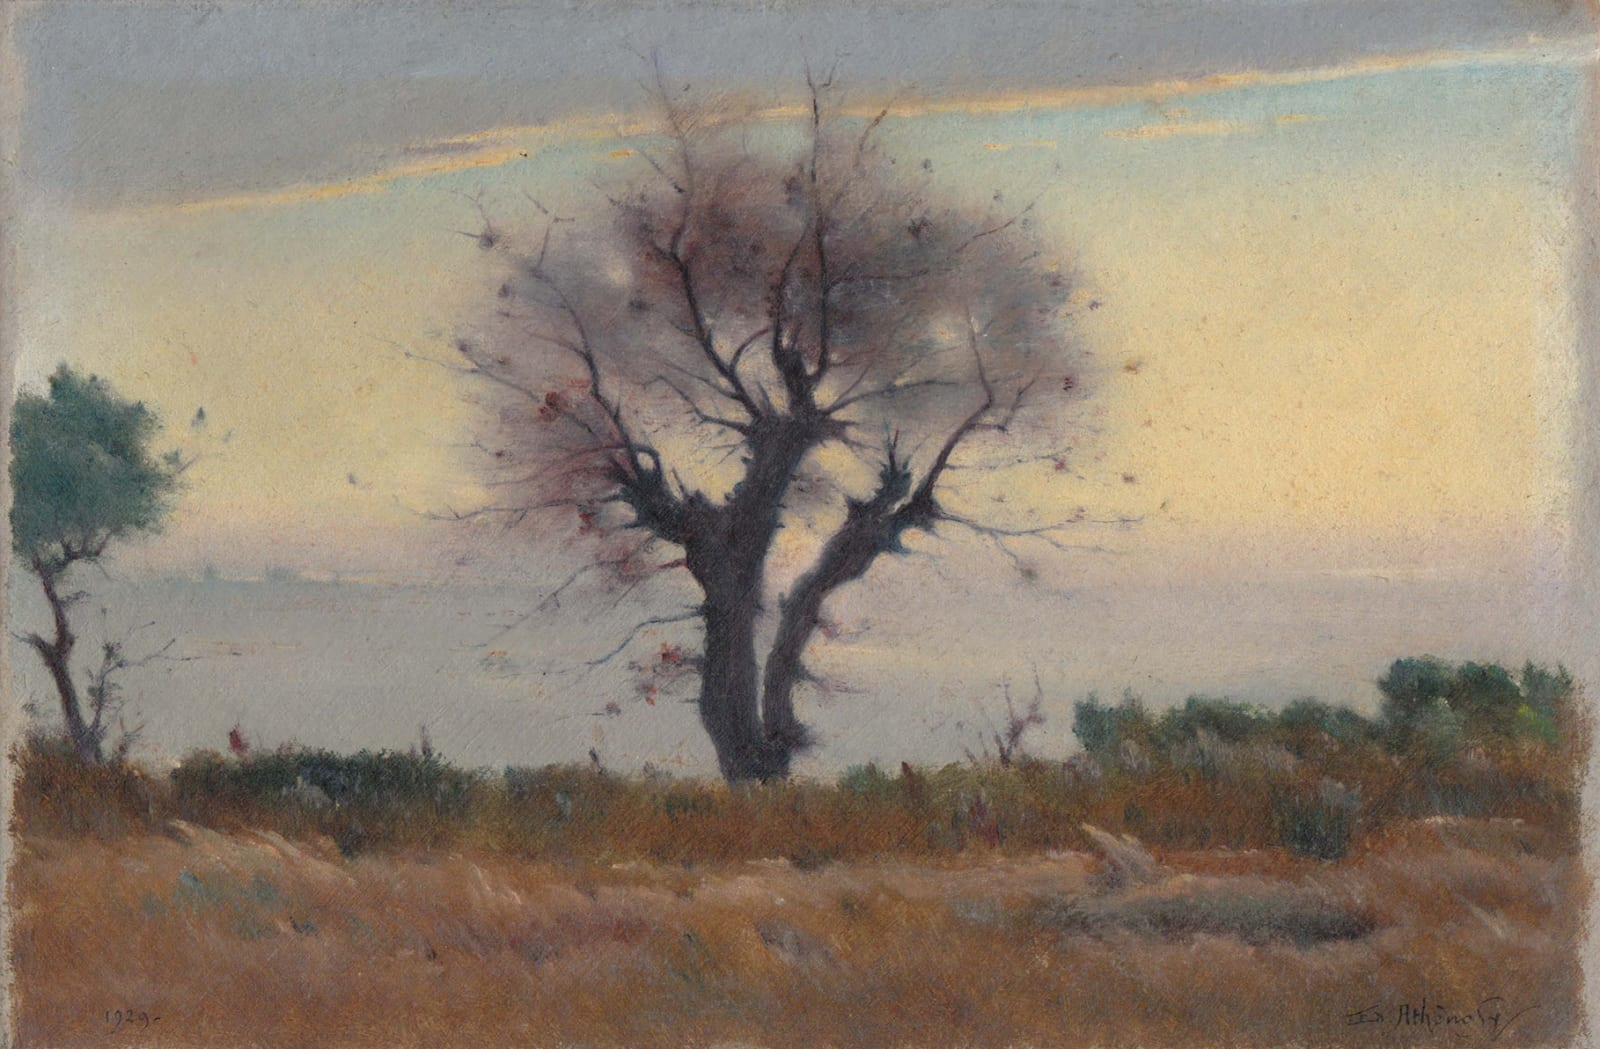 EDOUARD ATHÉNOSY, Brown and purple grey tree, 1929